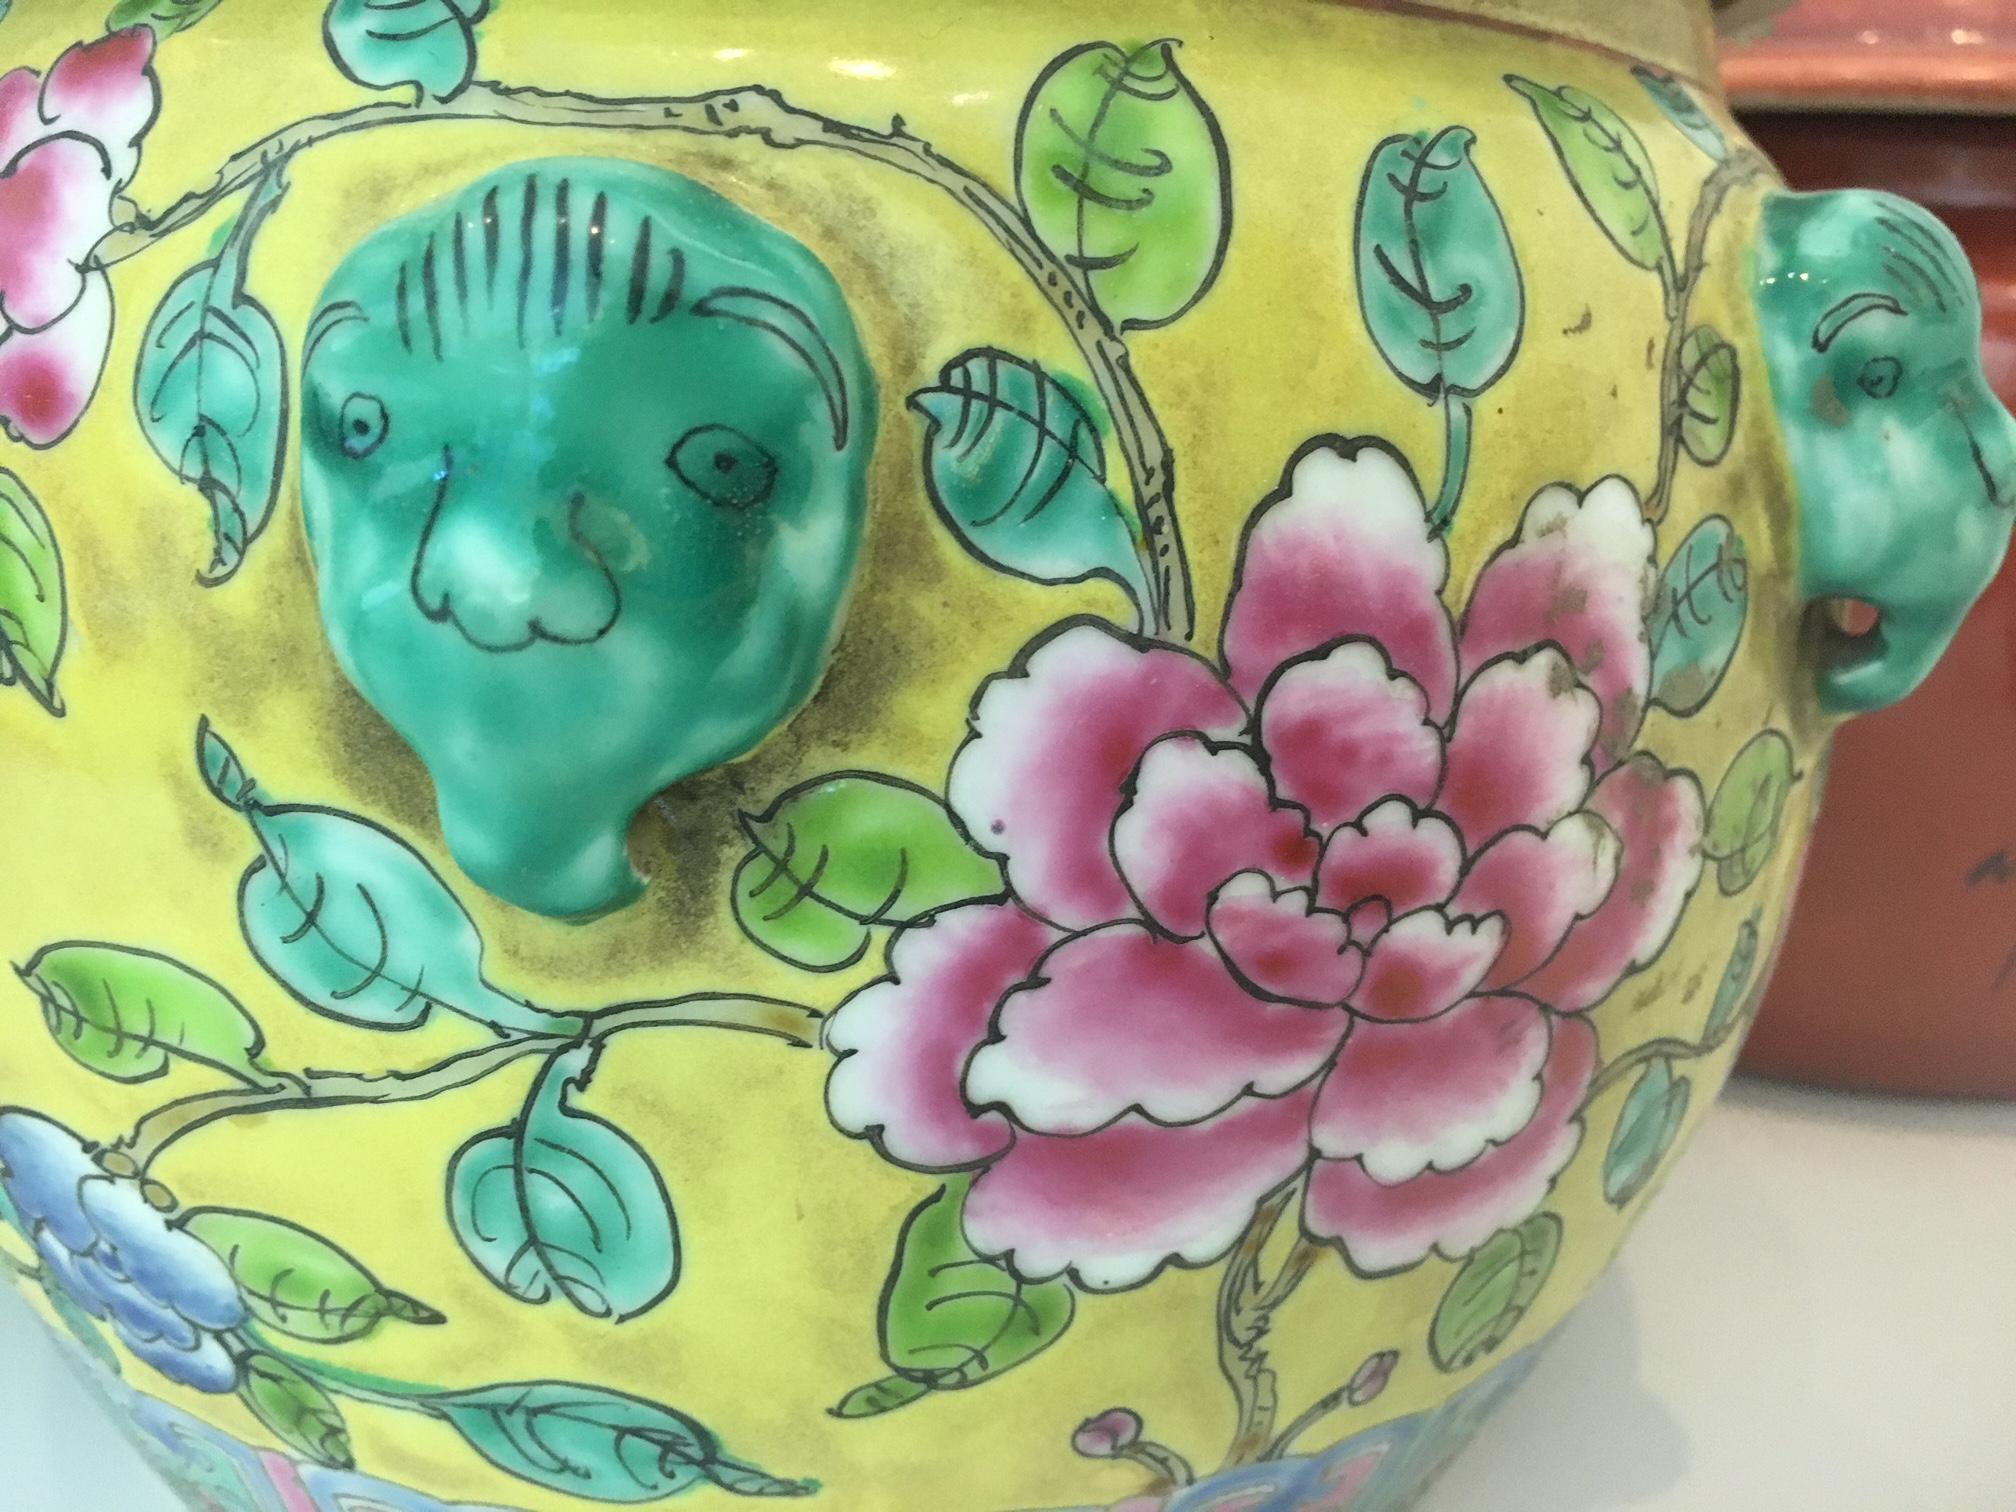 Ming Art